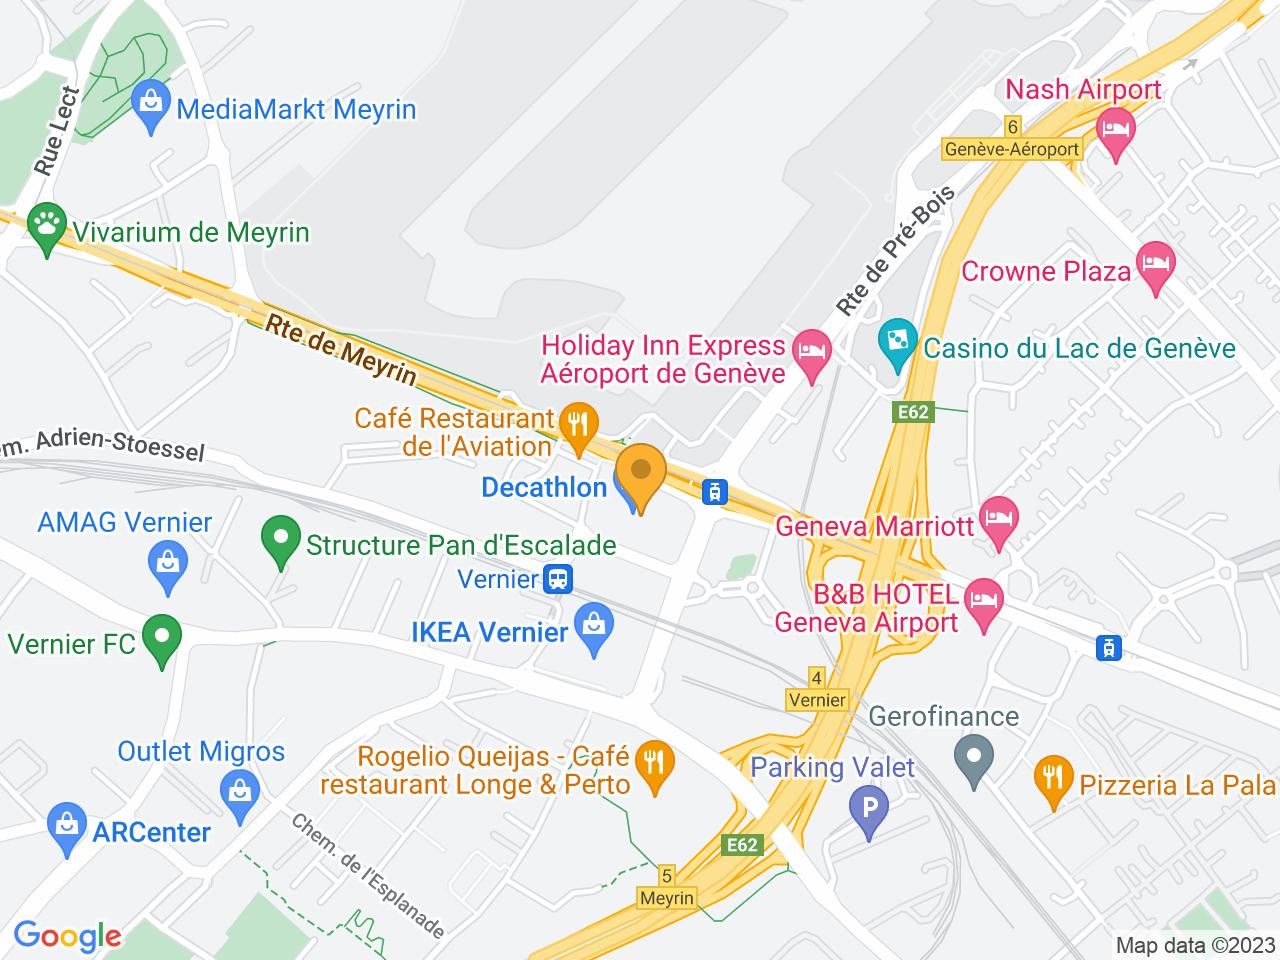 Route de Meyrin 171, 1214 Vernier